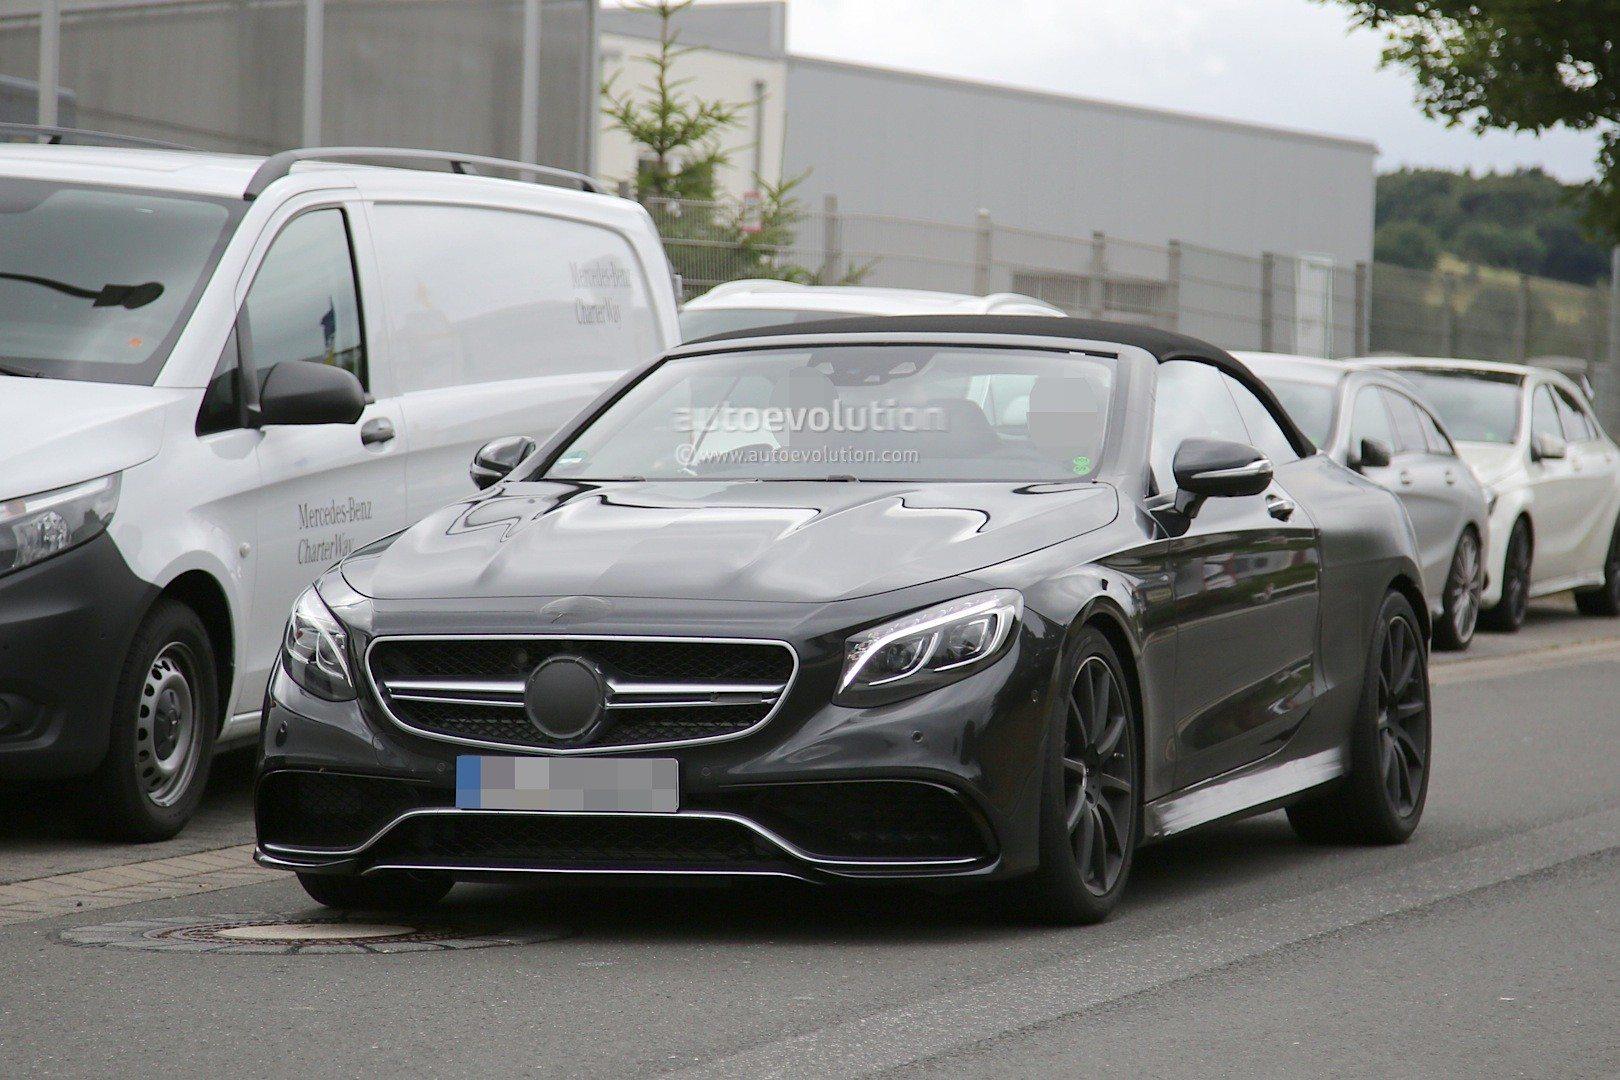 Mercedes-AMG S63 Cabriolet